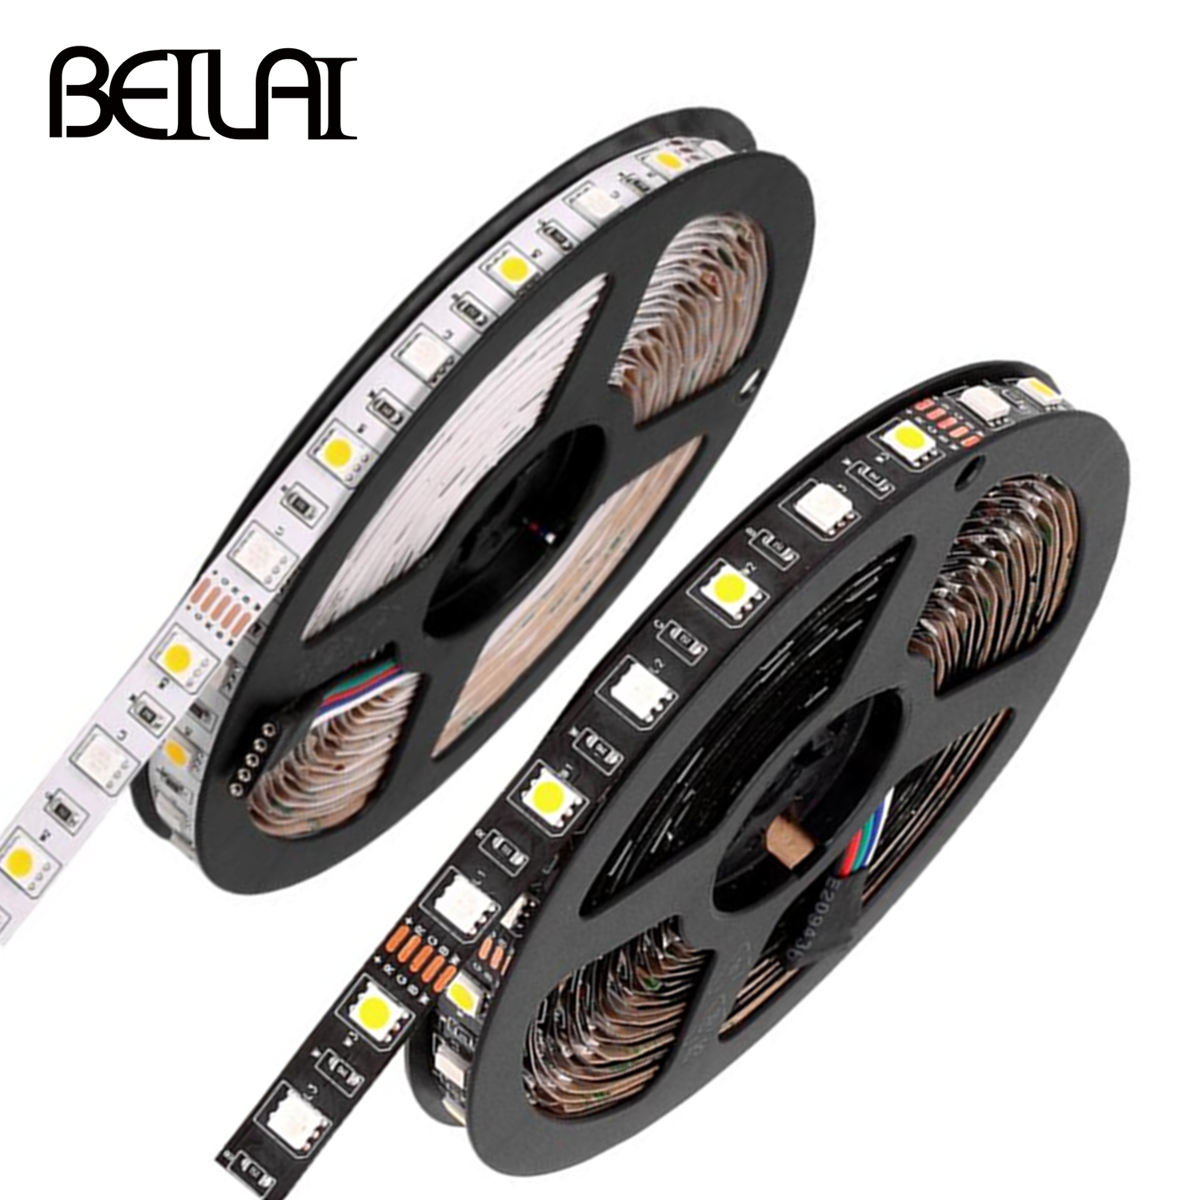 Beilai 5m Led Strip 5050 60led/m Dc12v Flexible Led Light Strip Rgb Warm Cool White Led Ruban Luces Led Tiras Lights & Lighting